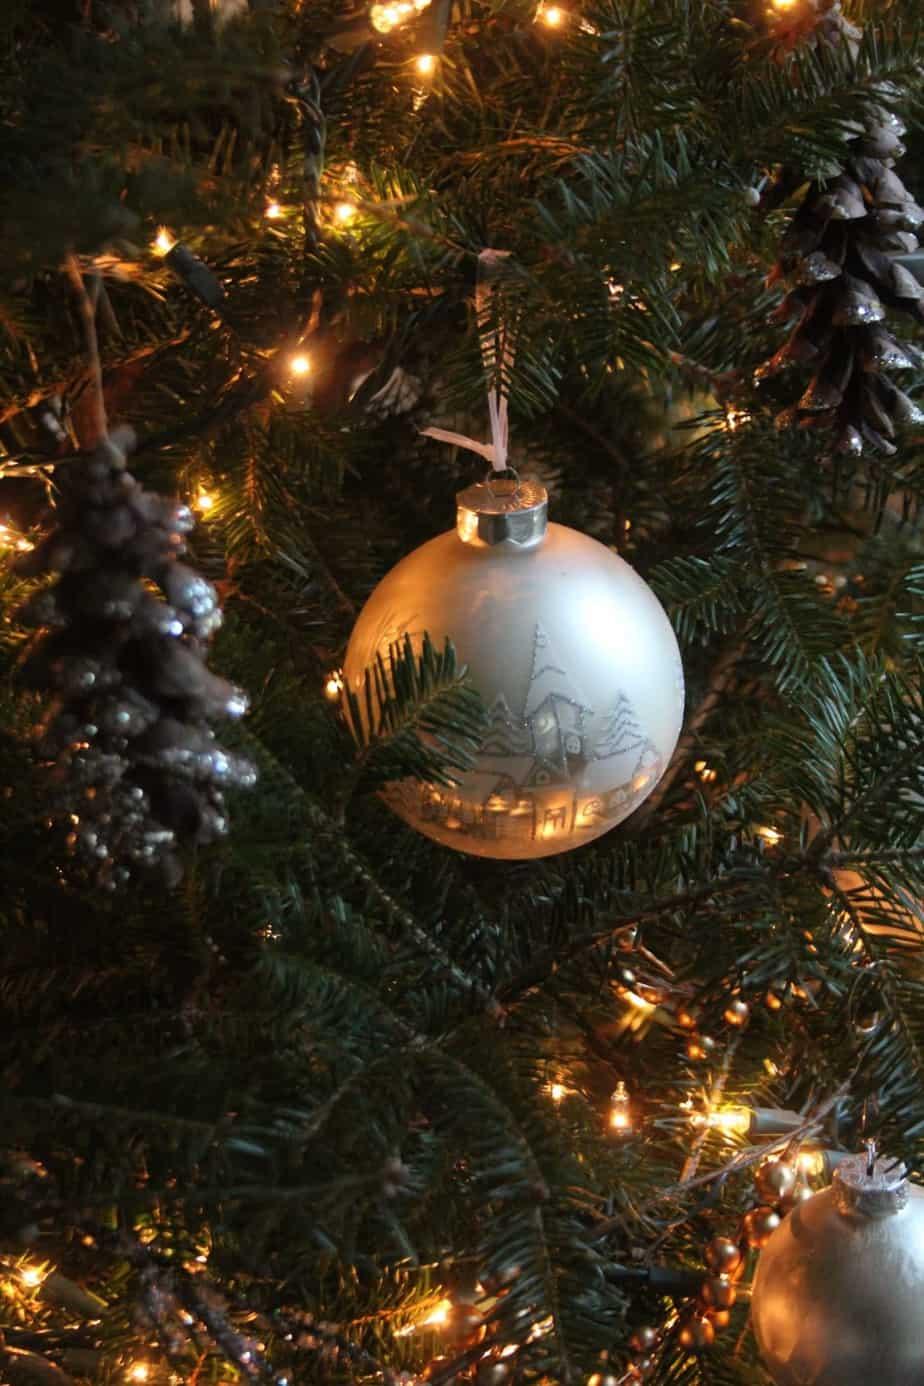 A woodland Christmas tree with tree lights illuminating house ornament